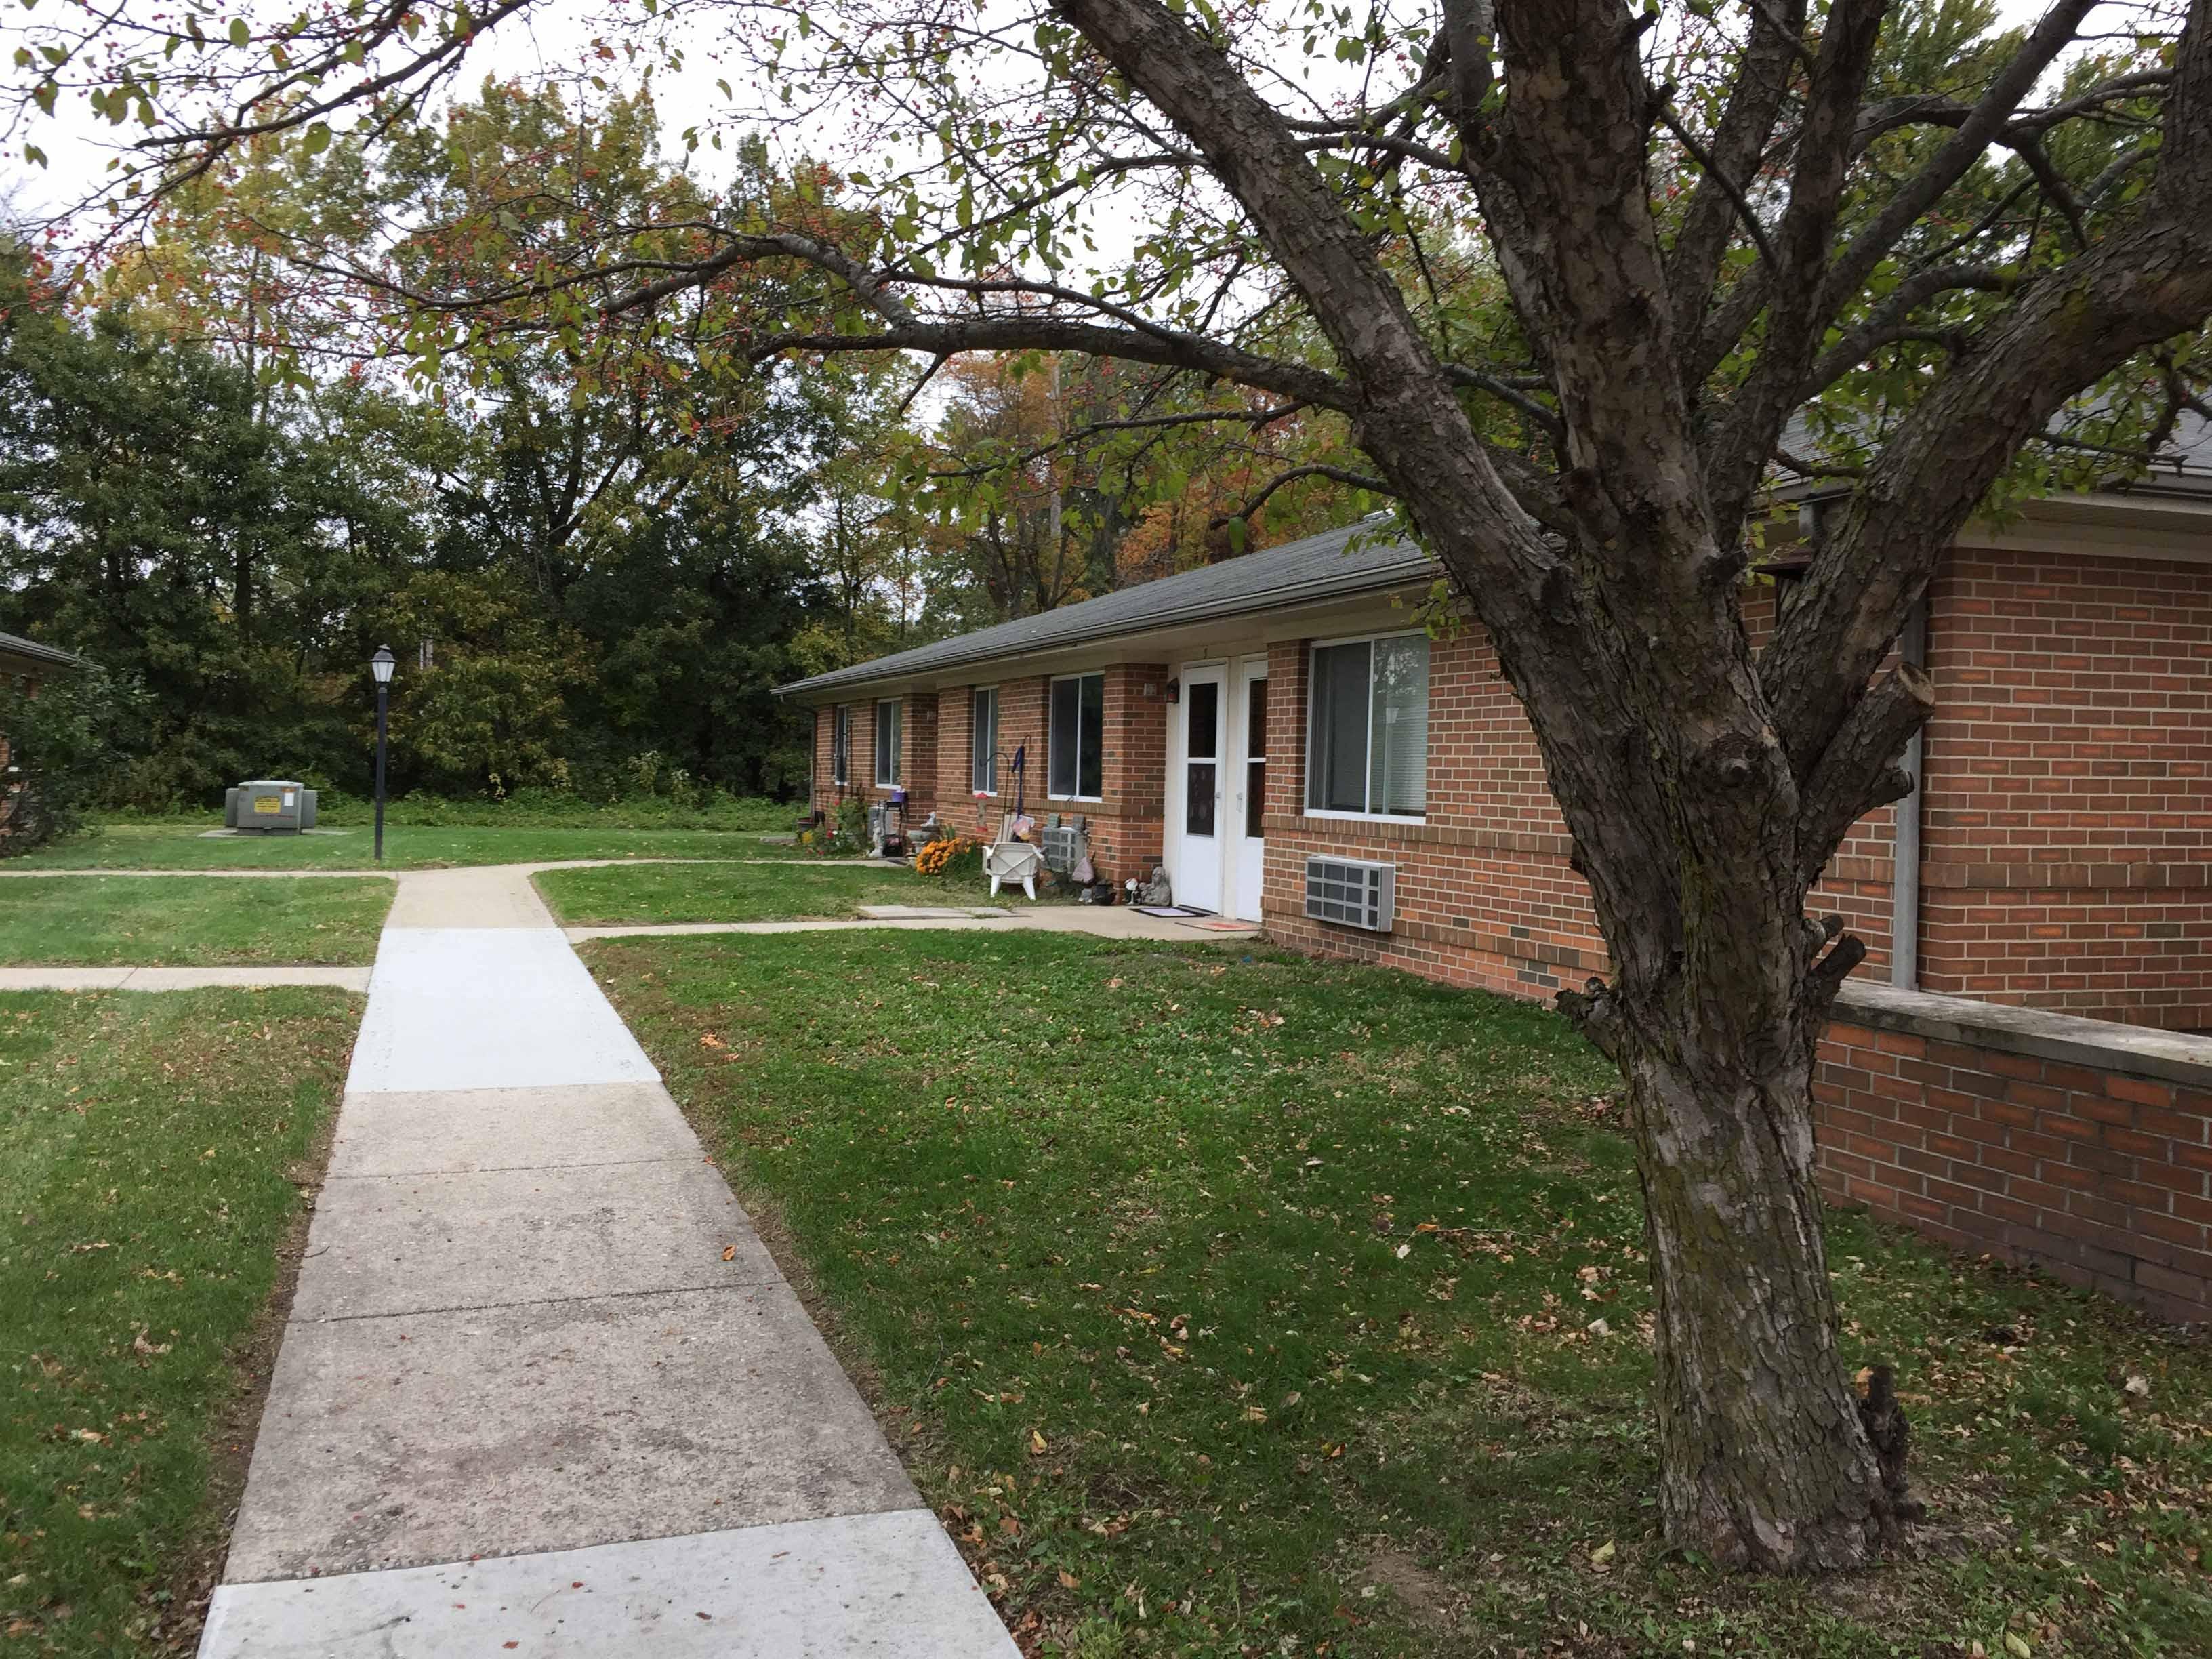 Image of Village Apartments of Riverton in Riverton, Illinois